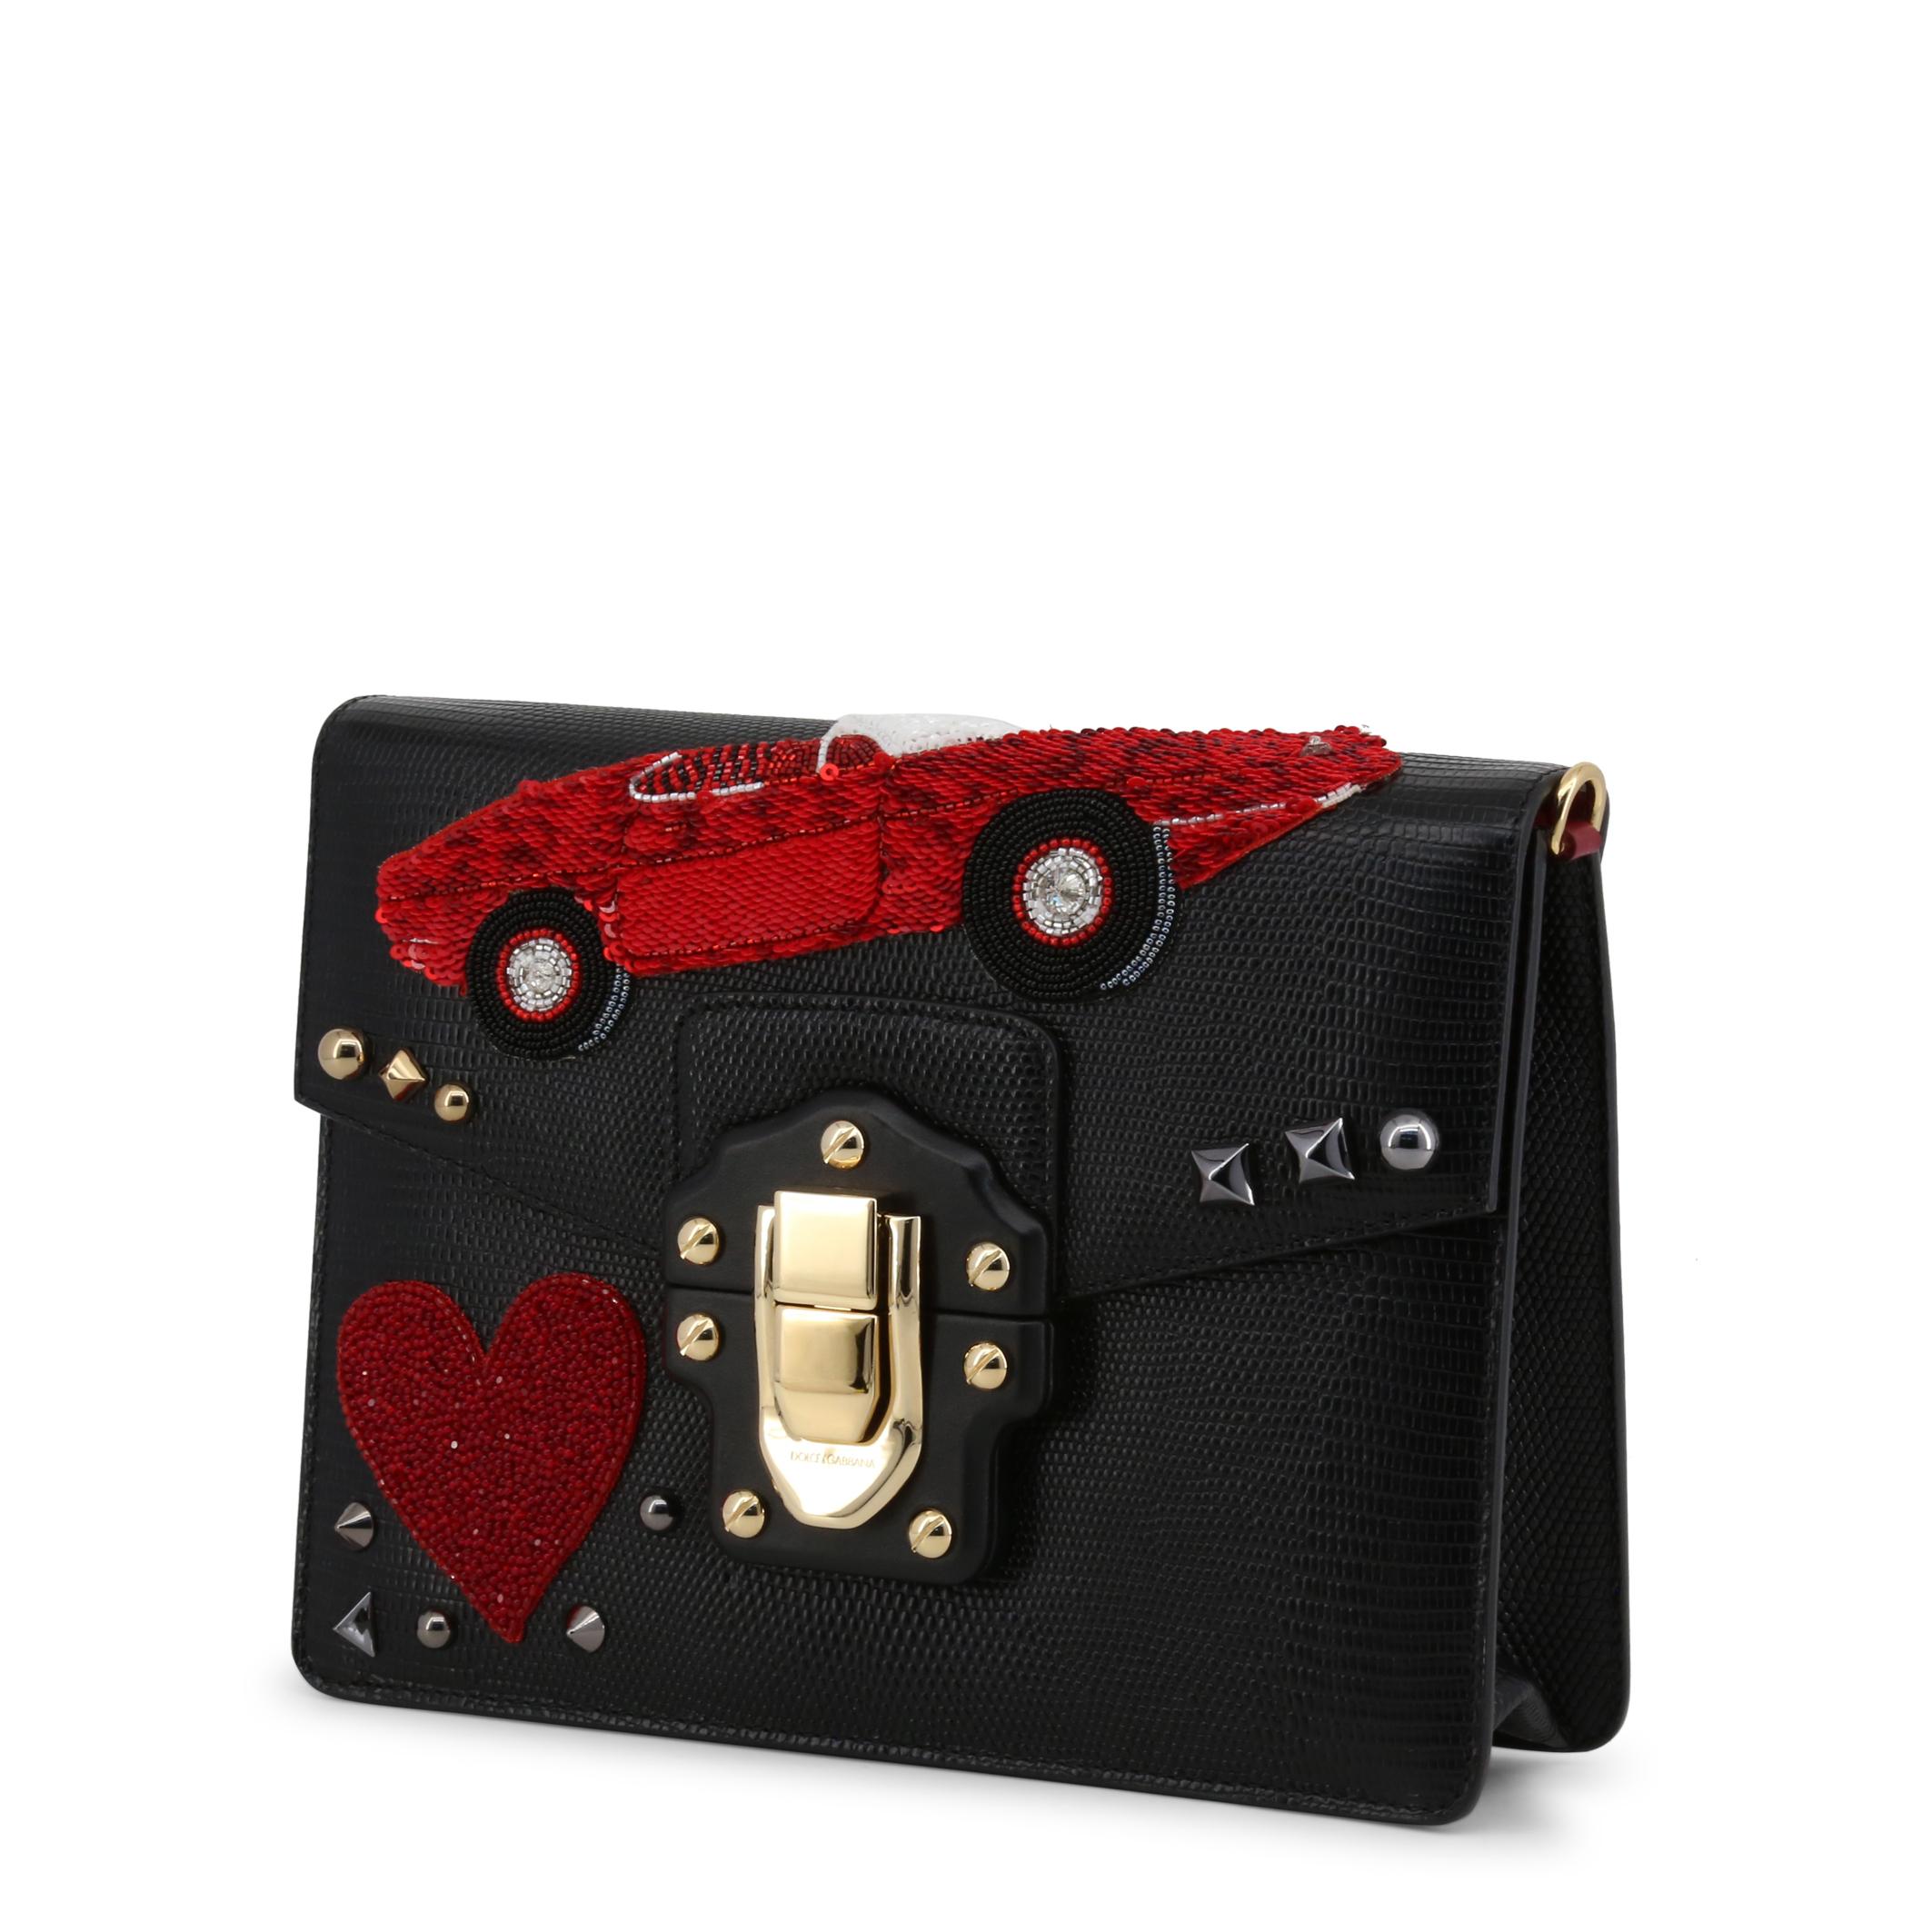 Borse-a-tracolla-Dolce-amp-Gabbana-BB631AAS4768-Donna-Nero-100109 miniatura 2